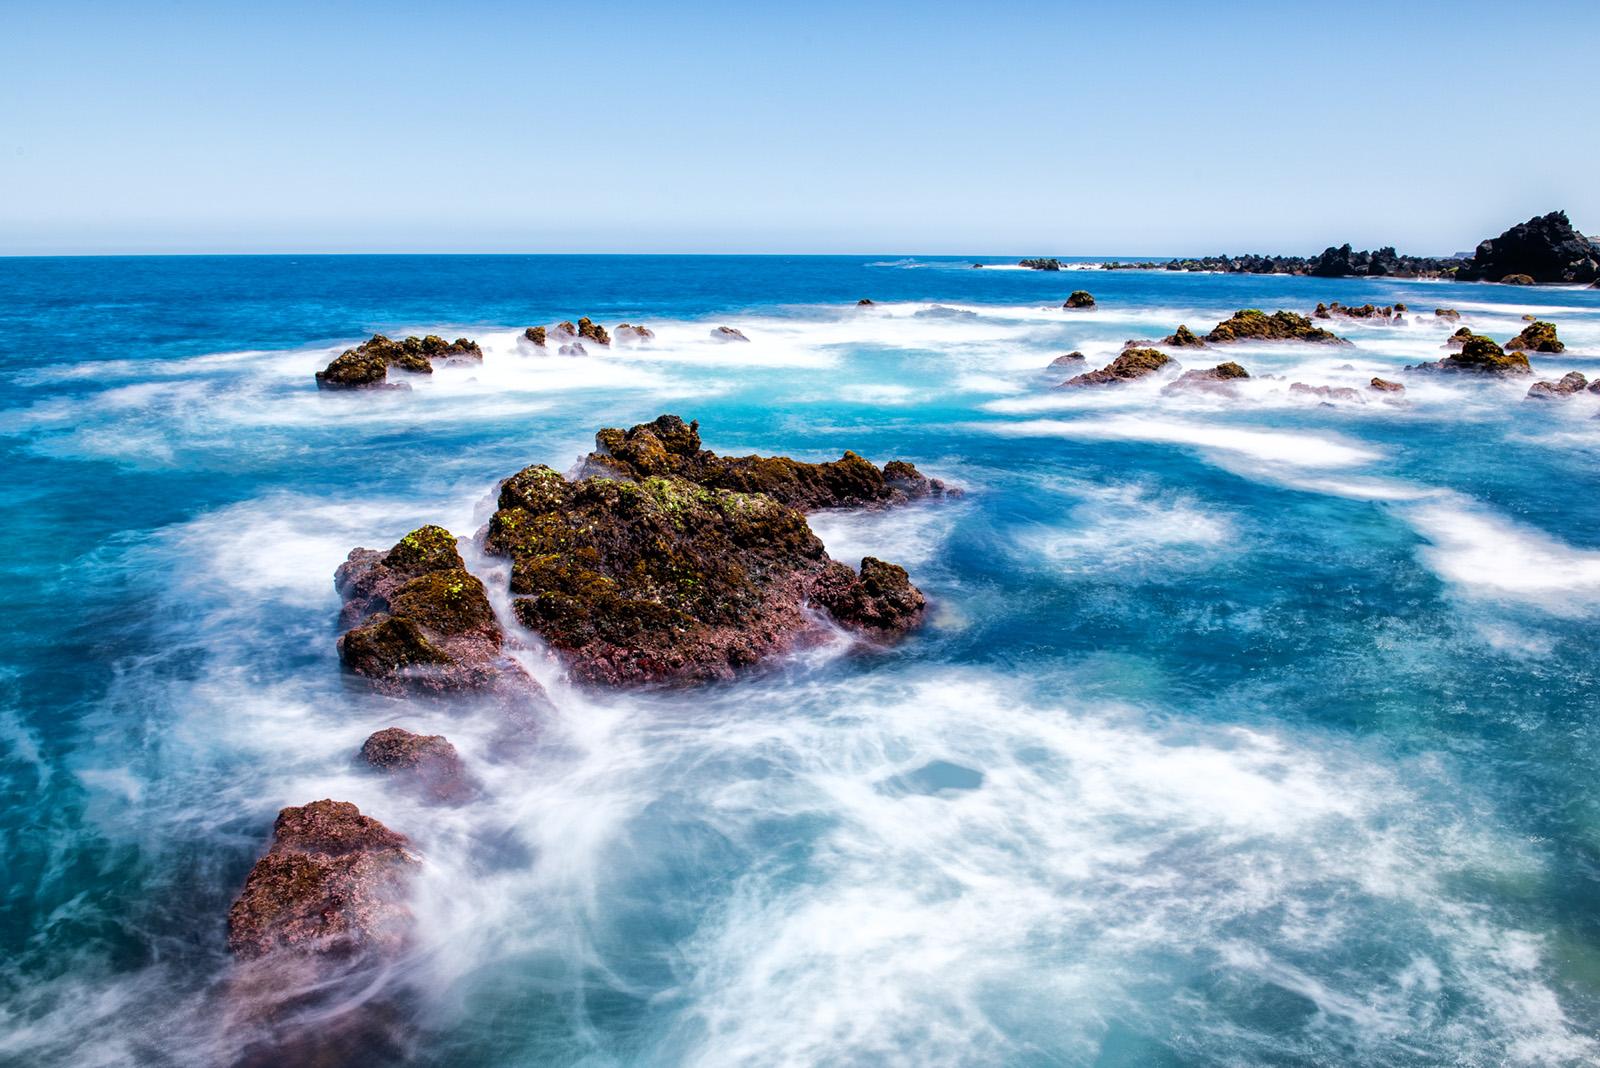 Lava Rocks on the Ocean